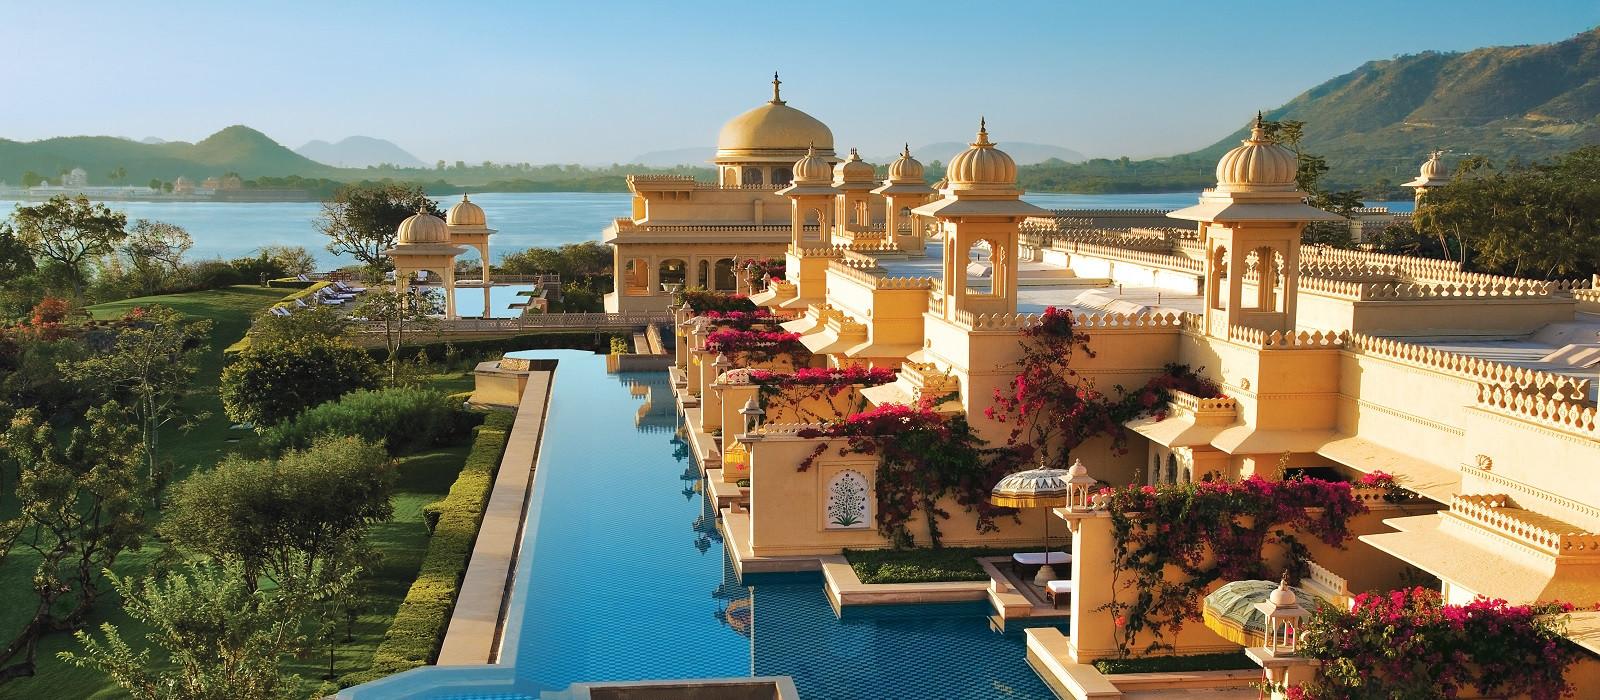 Oberoi Exclusive: Tiger Safari and Rajasthan Tour Trip 1